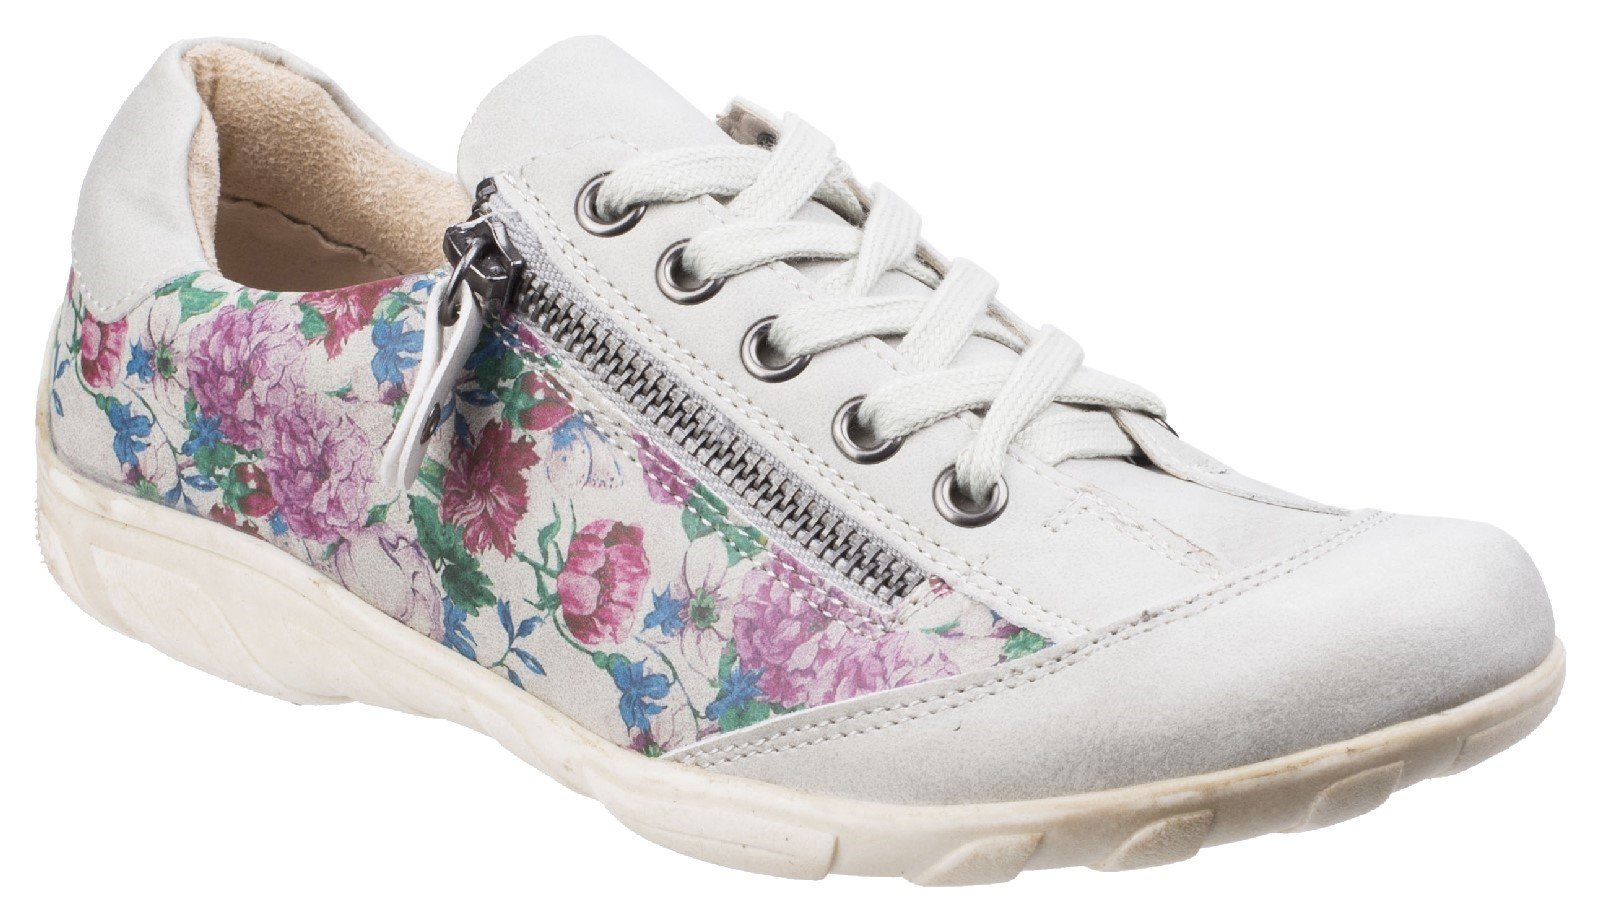 Fleet & Foster Women's Juniper Lace Up Trainer Black 26286-43844 - Floral 3